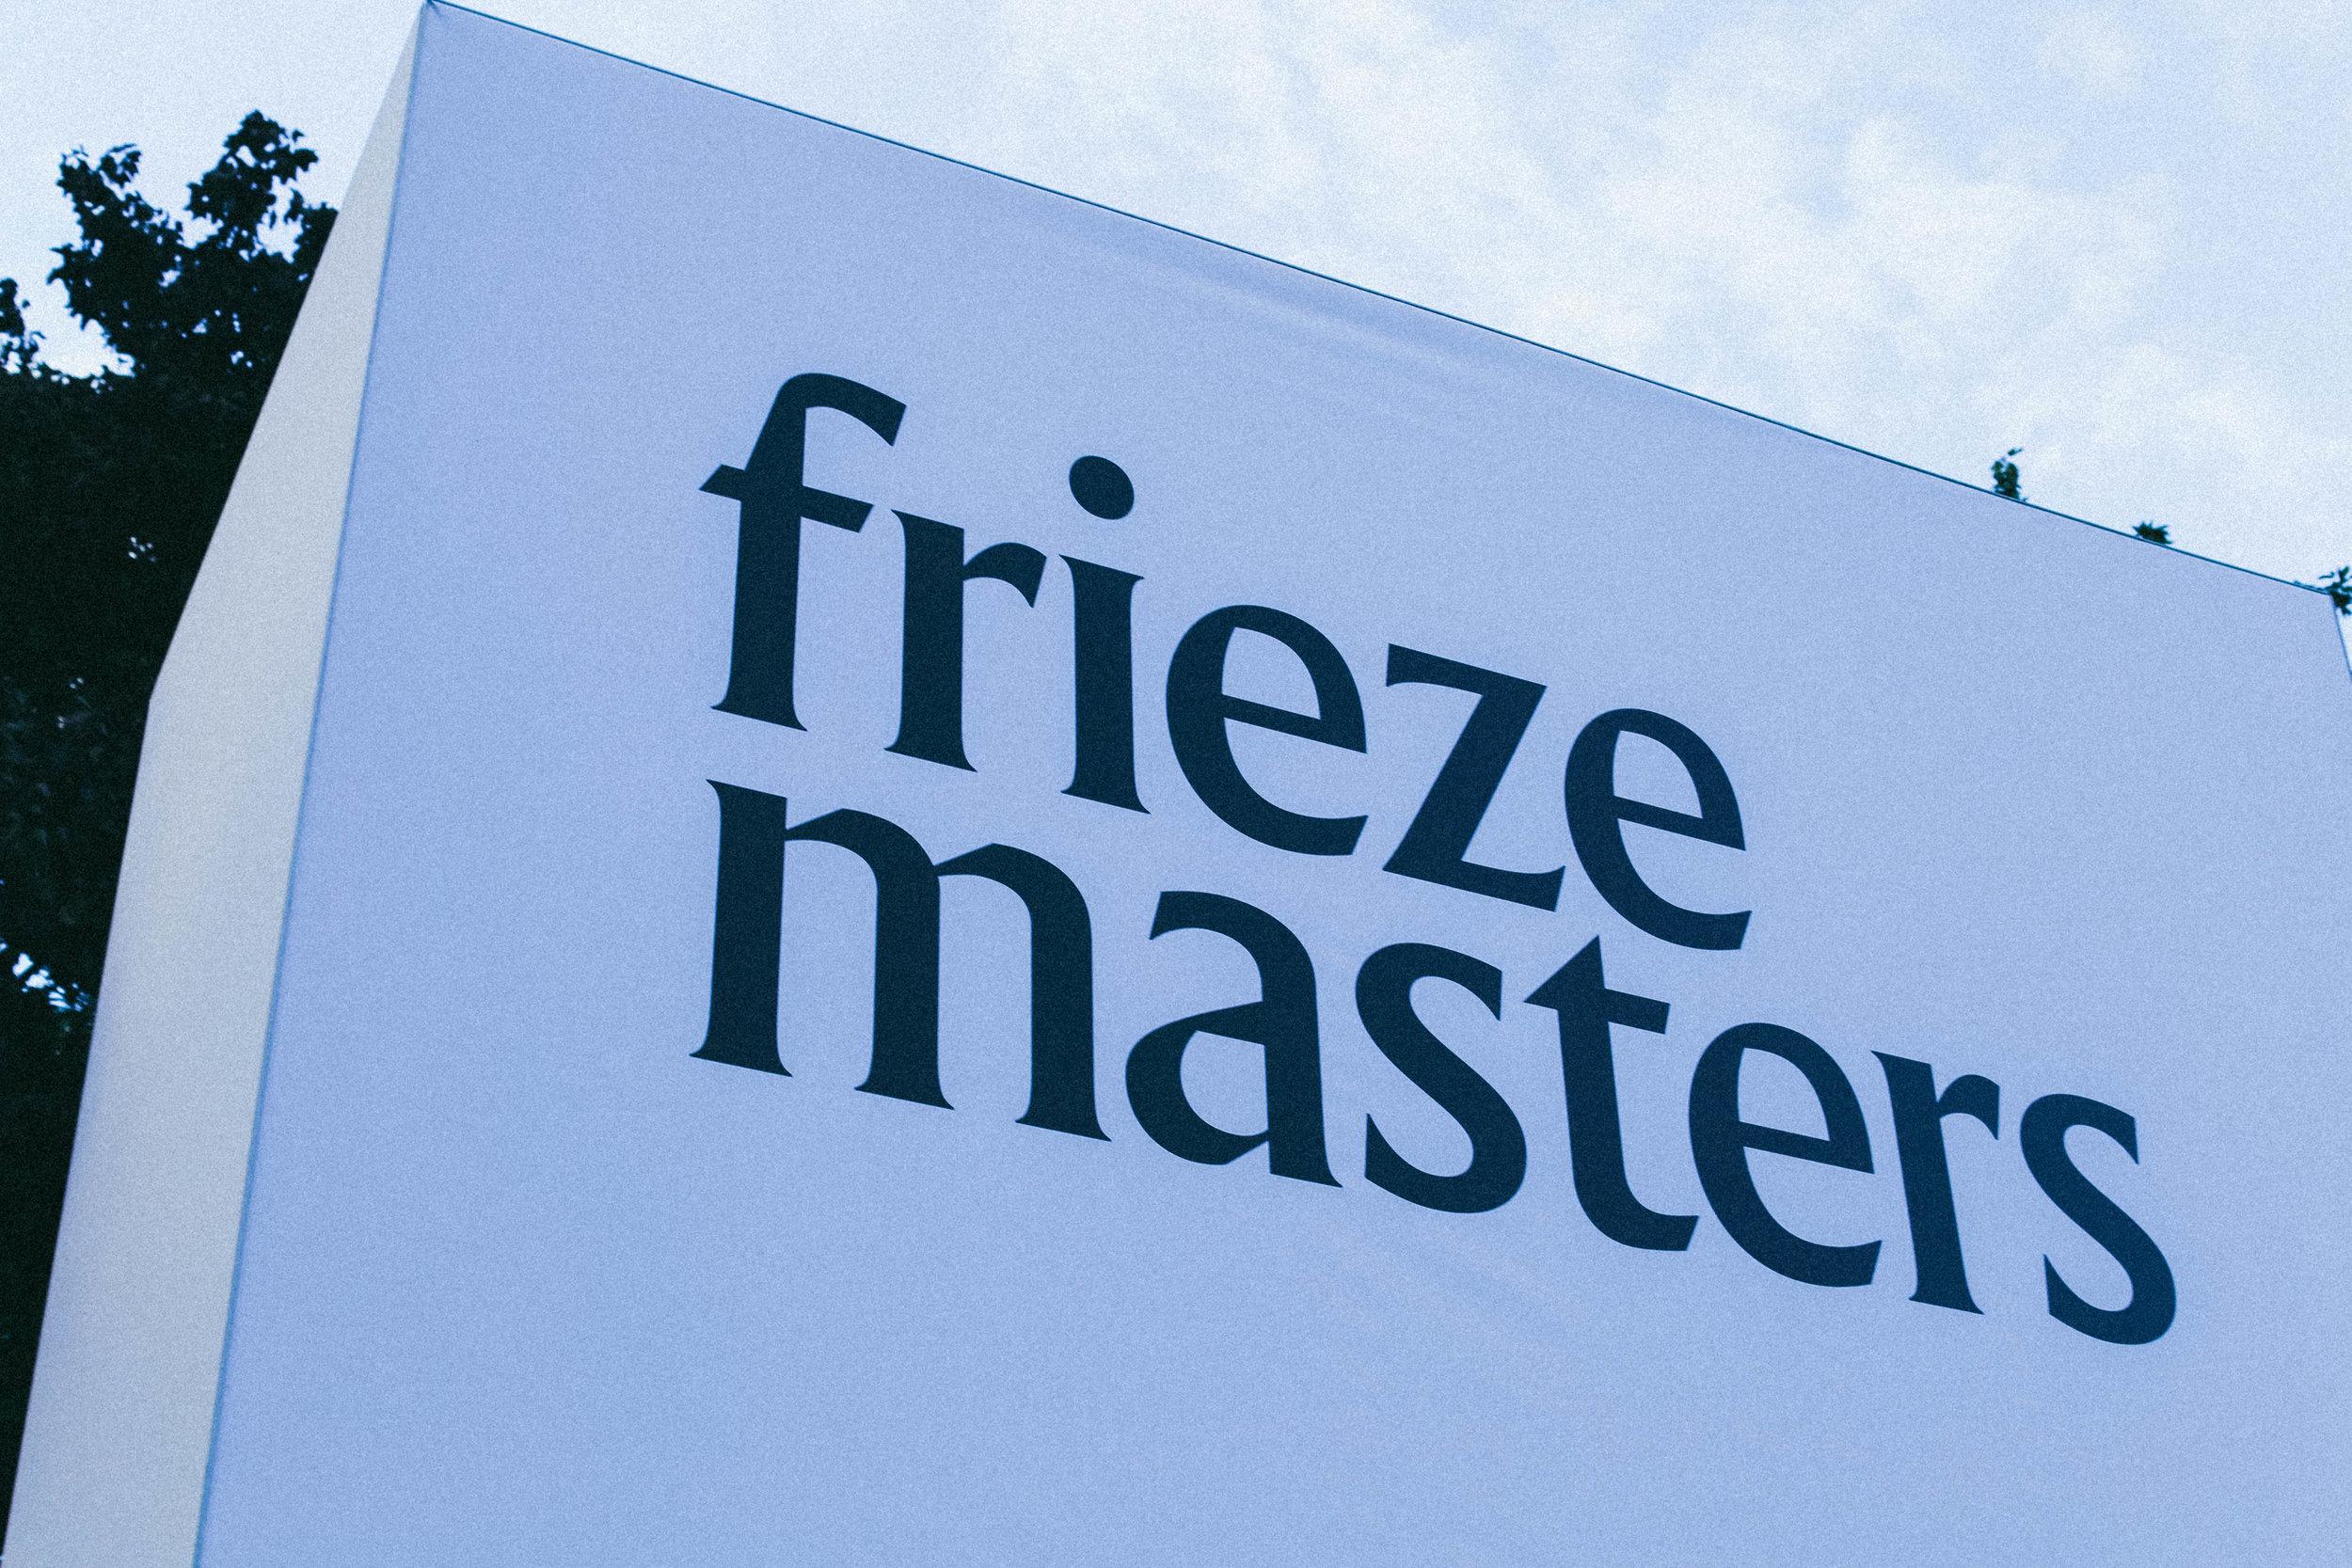 Frieze Masters Art Fair 2016